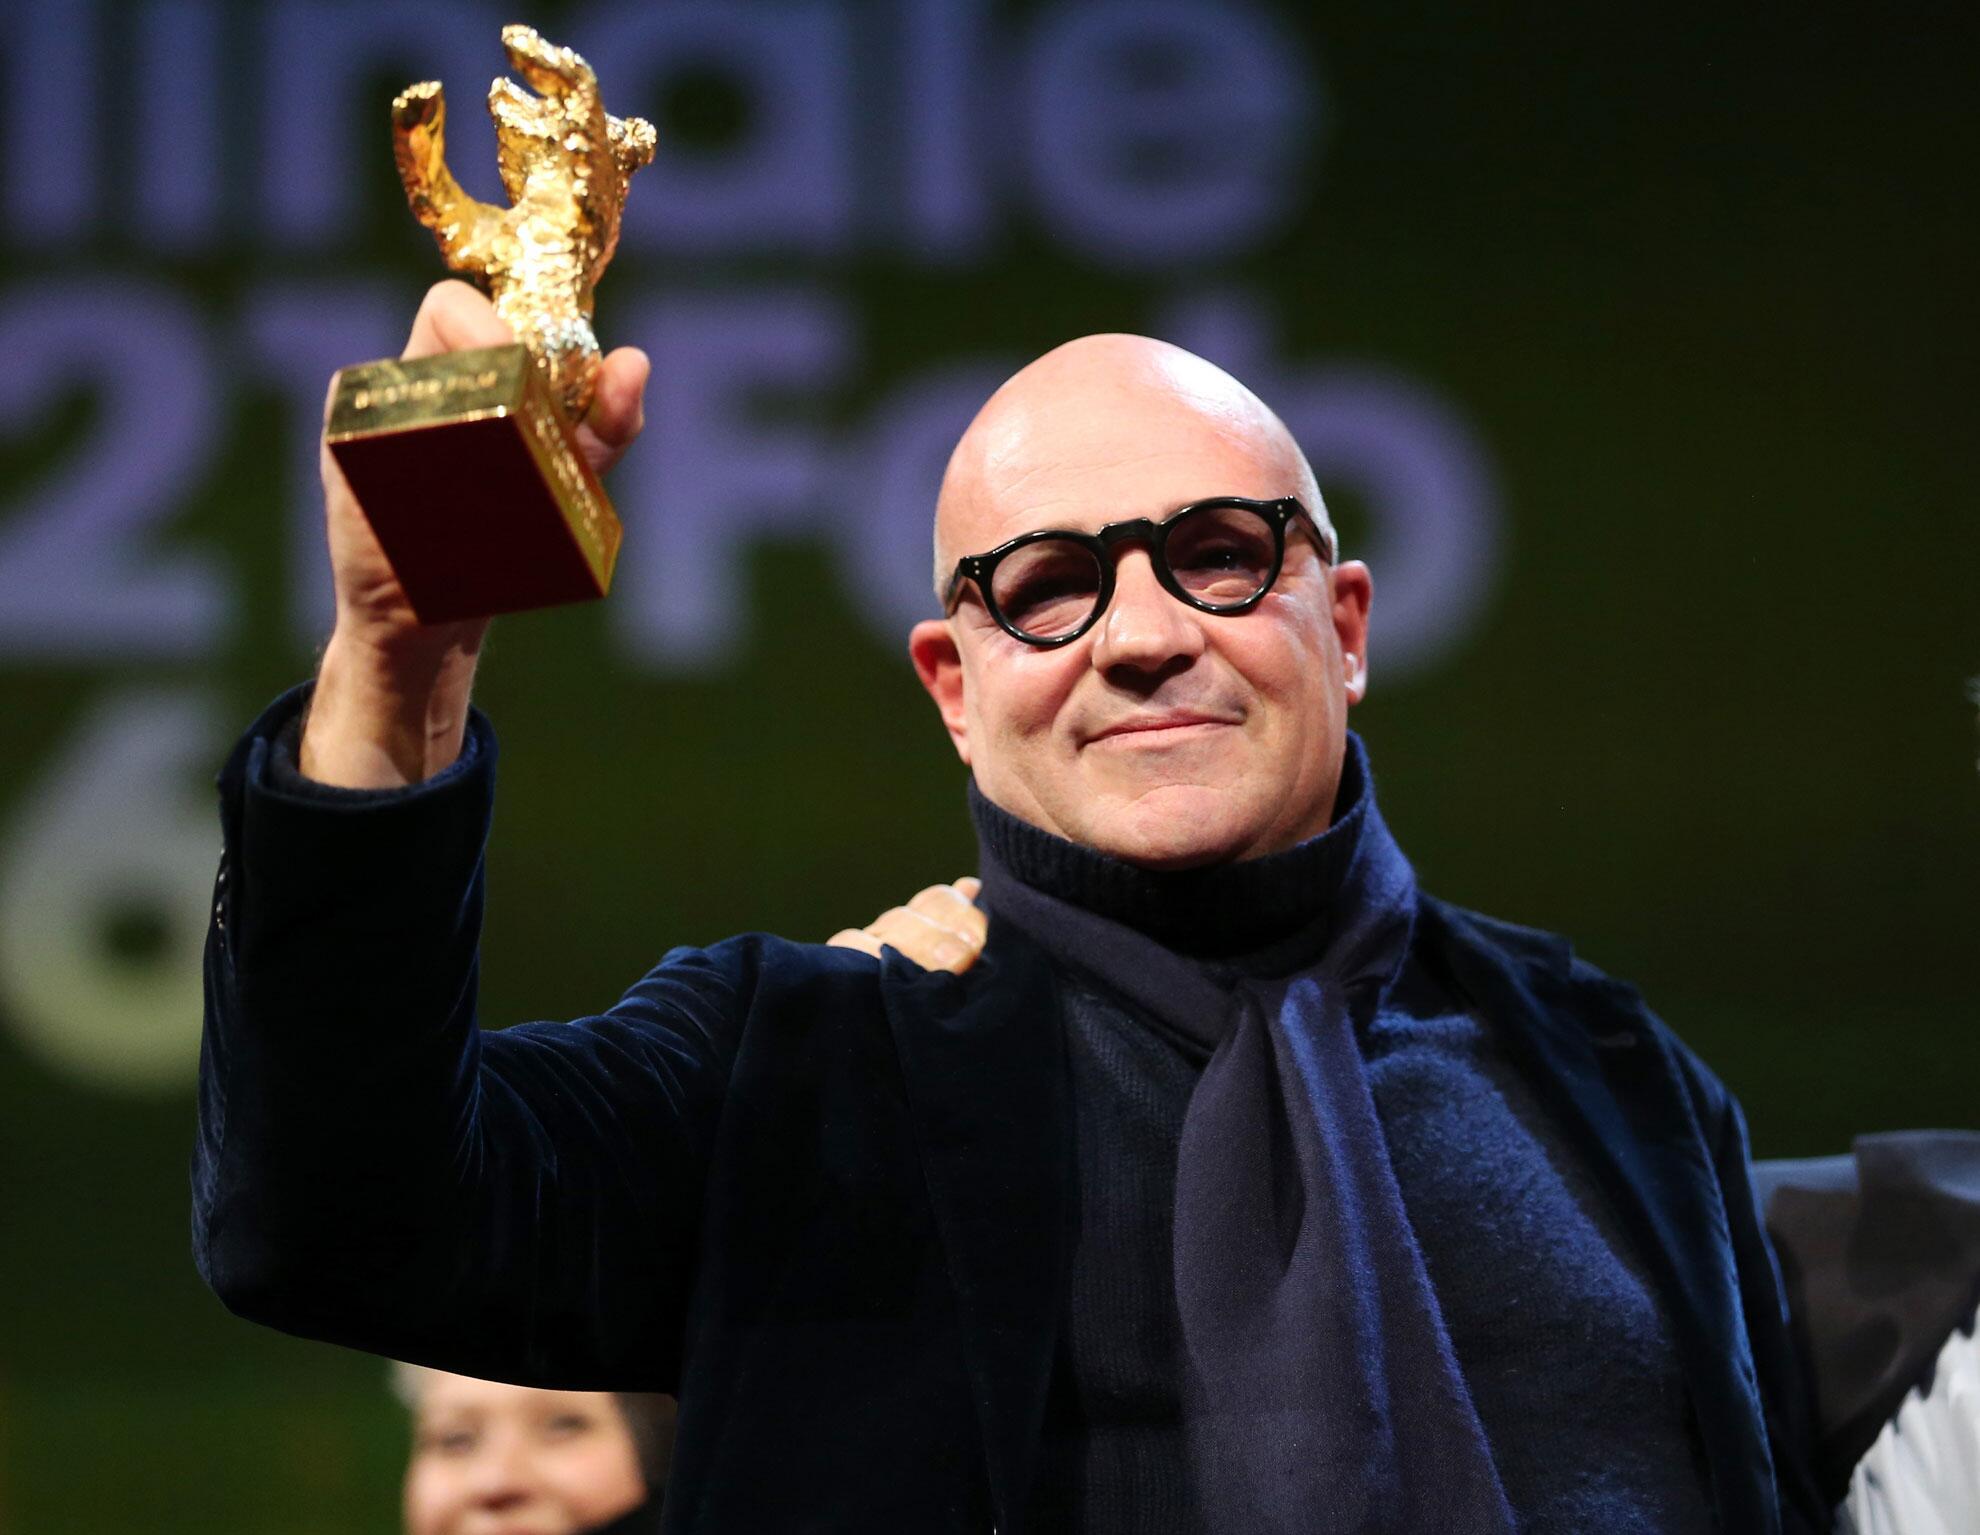 Bild zu 66. Berlinale - Preisverleihung